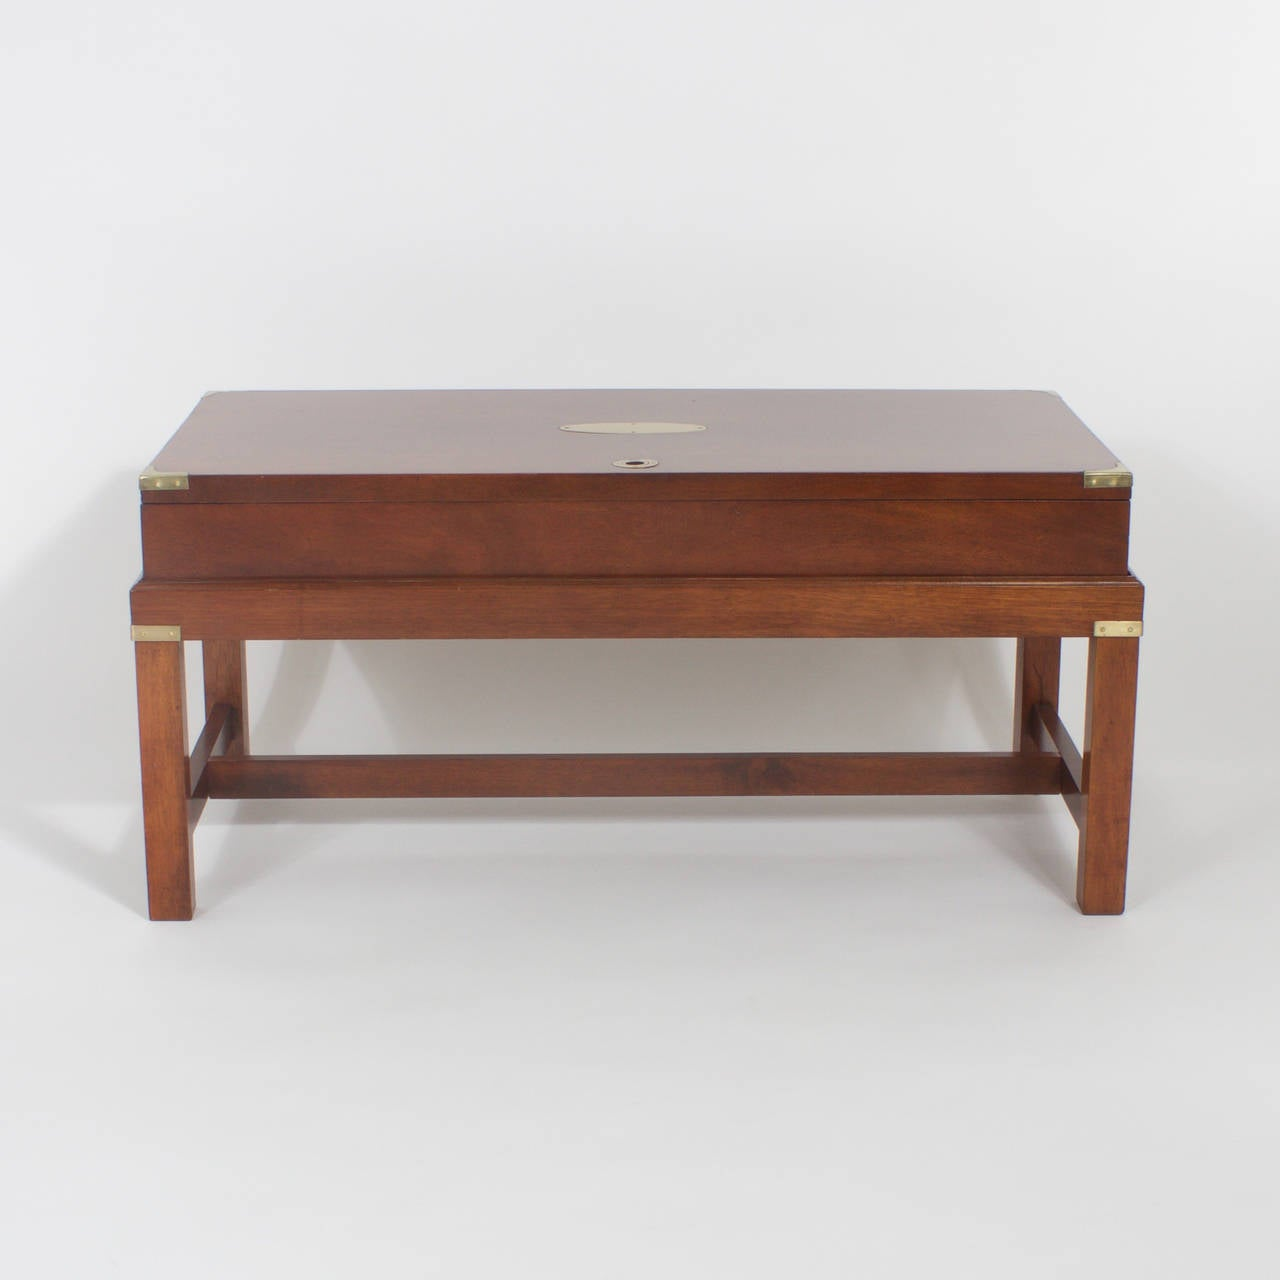 Awe Inspiring Campaign Gun Case Table At 1Stdibs Dailytribune Chair Design For Home Dailytribuneorg